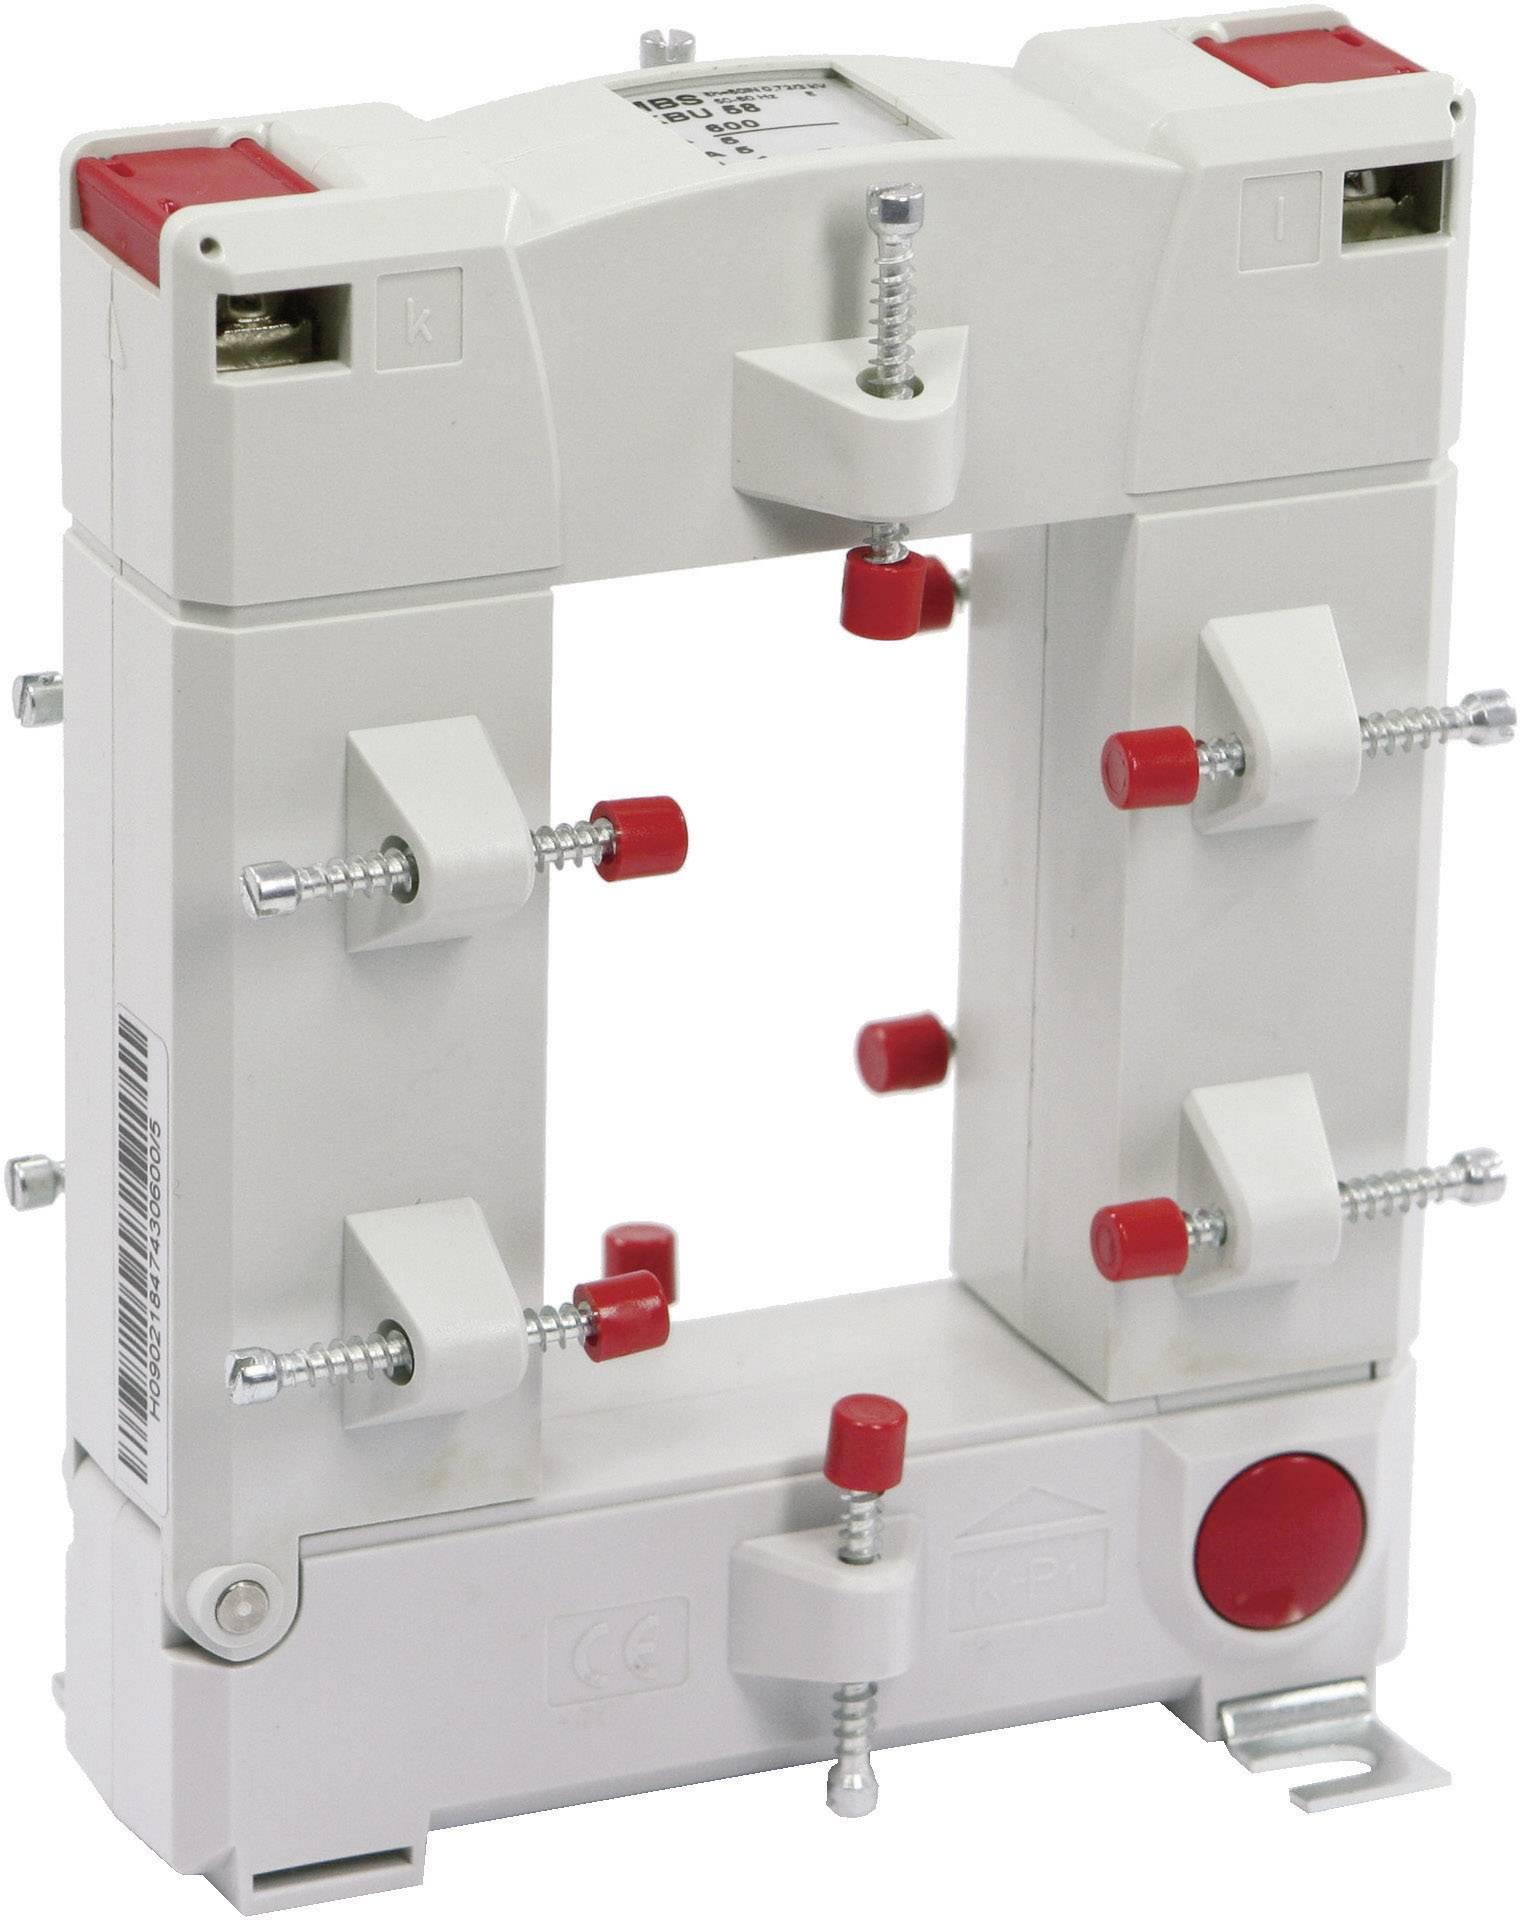 Zásuvný merací transformátor prúdu MBS KBU58 800/5A 7,5 VA KL.1